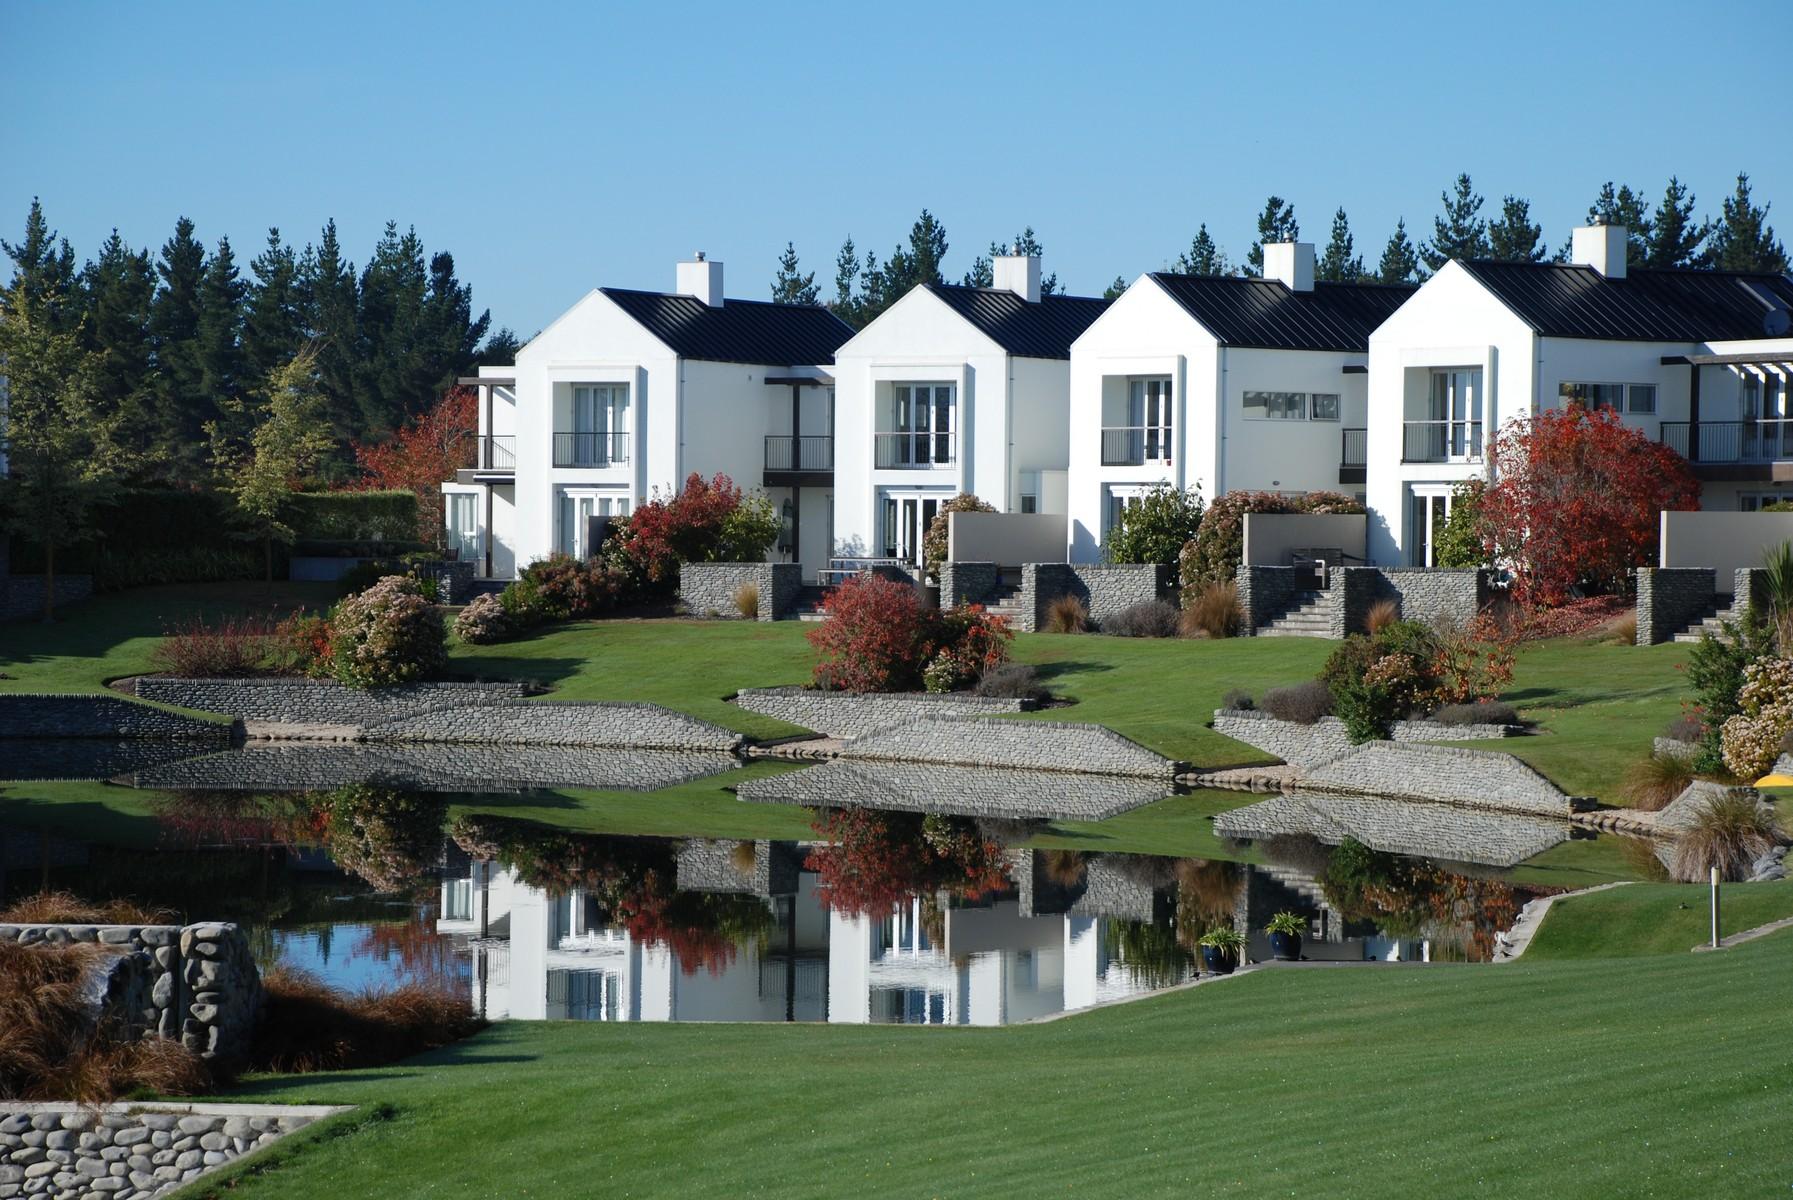 Apartment for Sale at Terrace Apartment 37 Harts Creek Lane Harewood Christchurch, Canterbury 8051 New Zealand